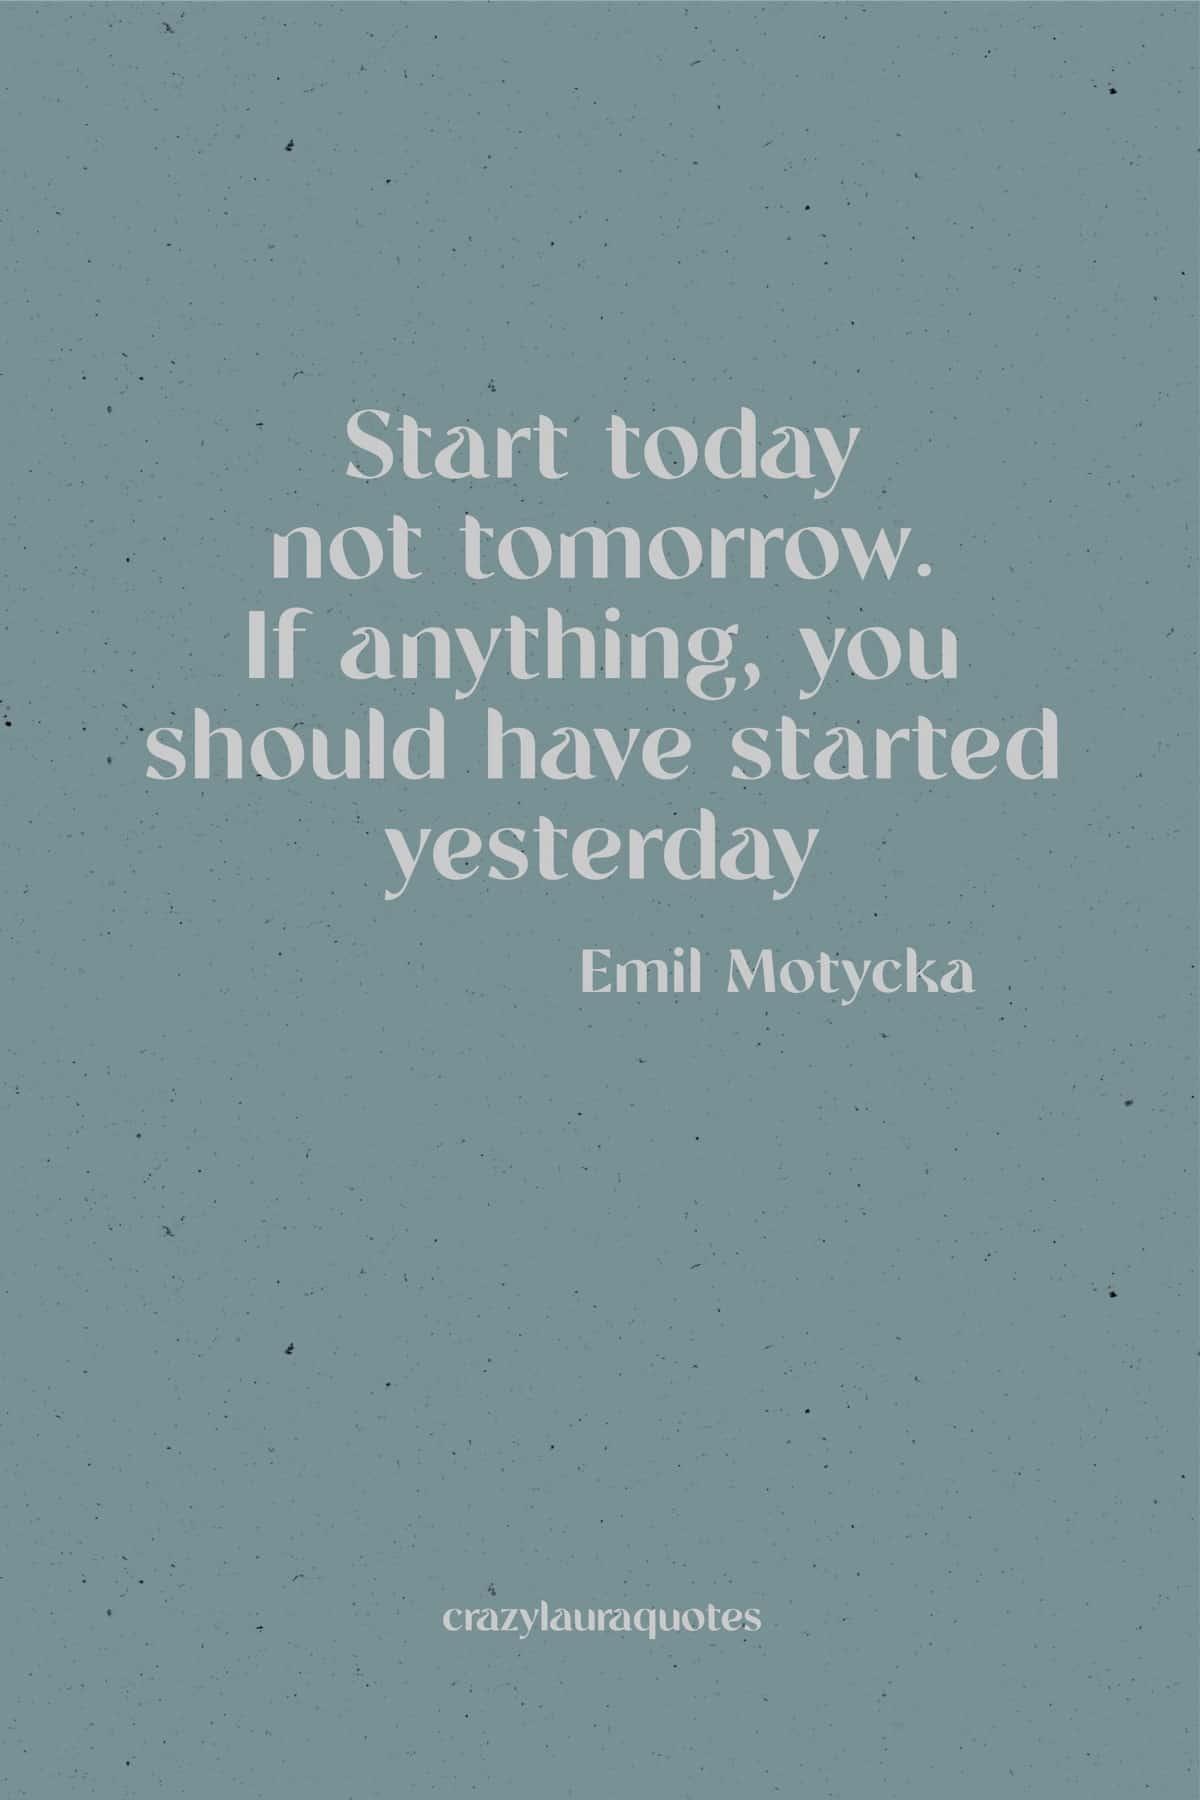 start today monday motivational saying